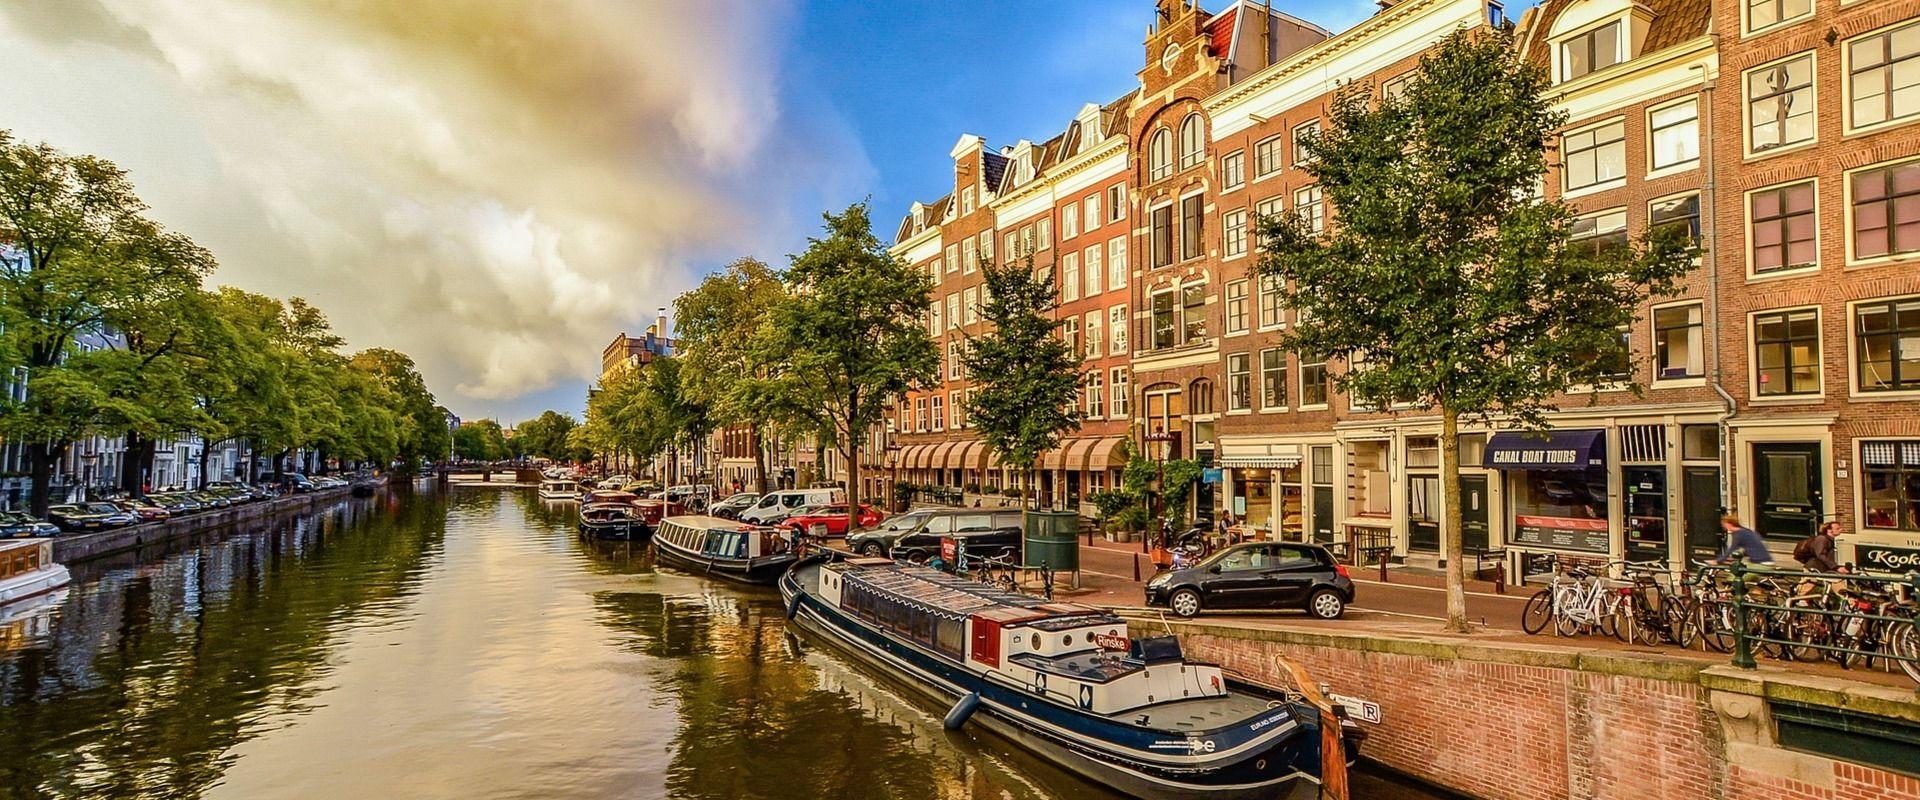 wide_fullhd_amsterdam-1910176_1920